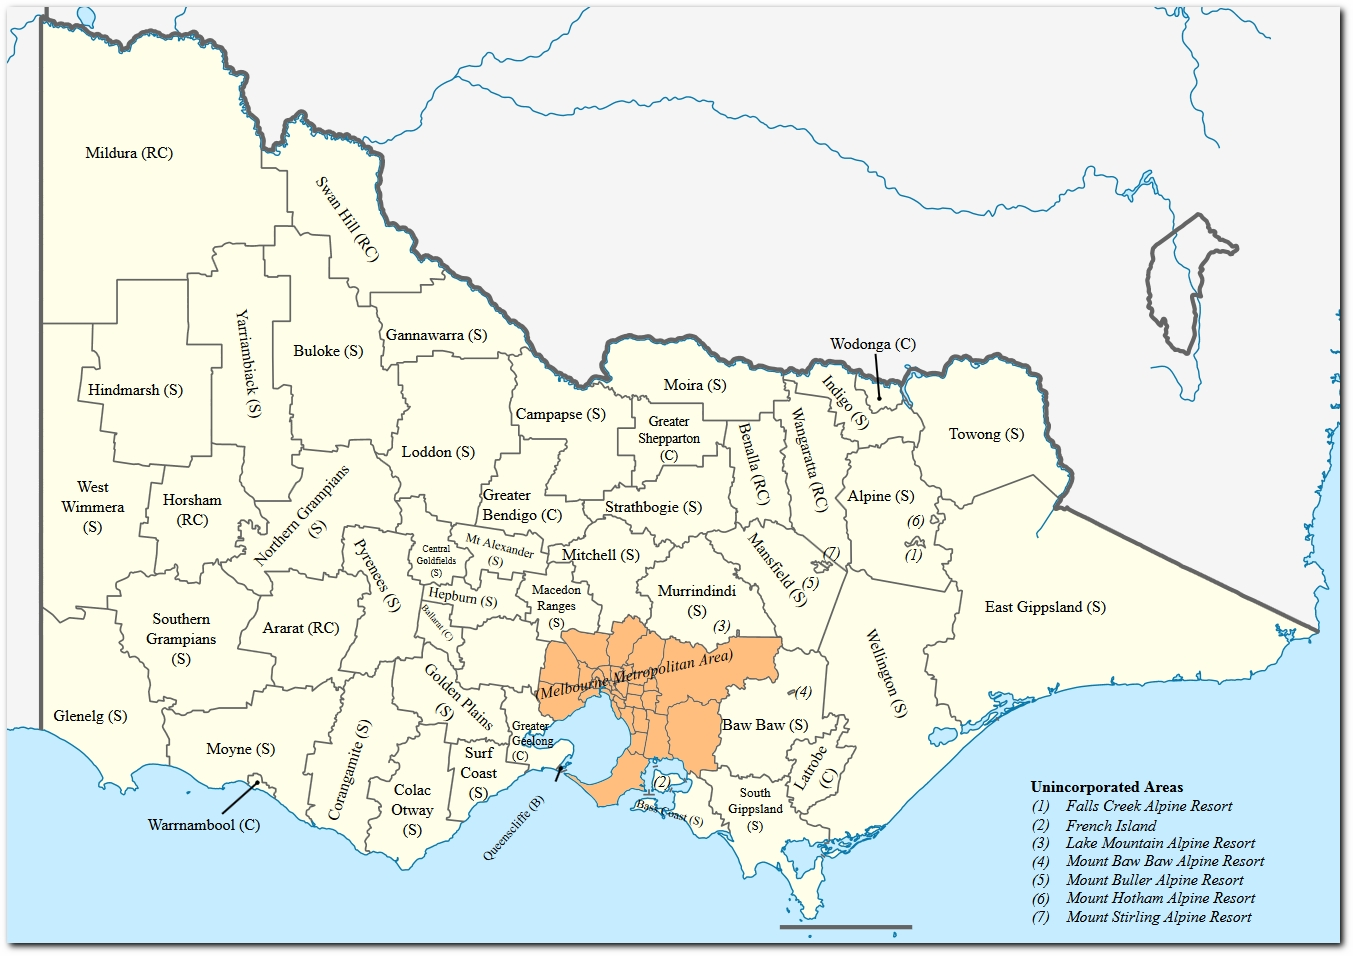 Metropolitan Melbourne – Propertydata with regard to Melbourne Greater Metropolitan Area Map